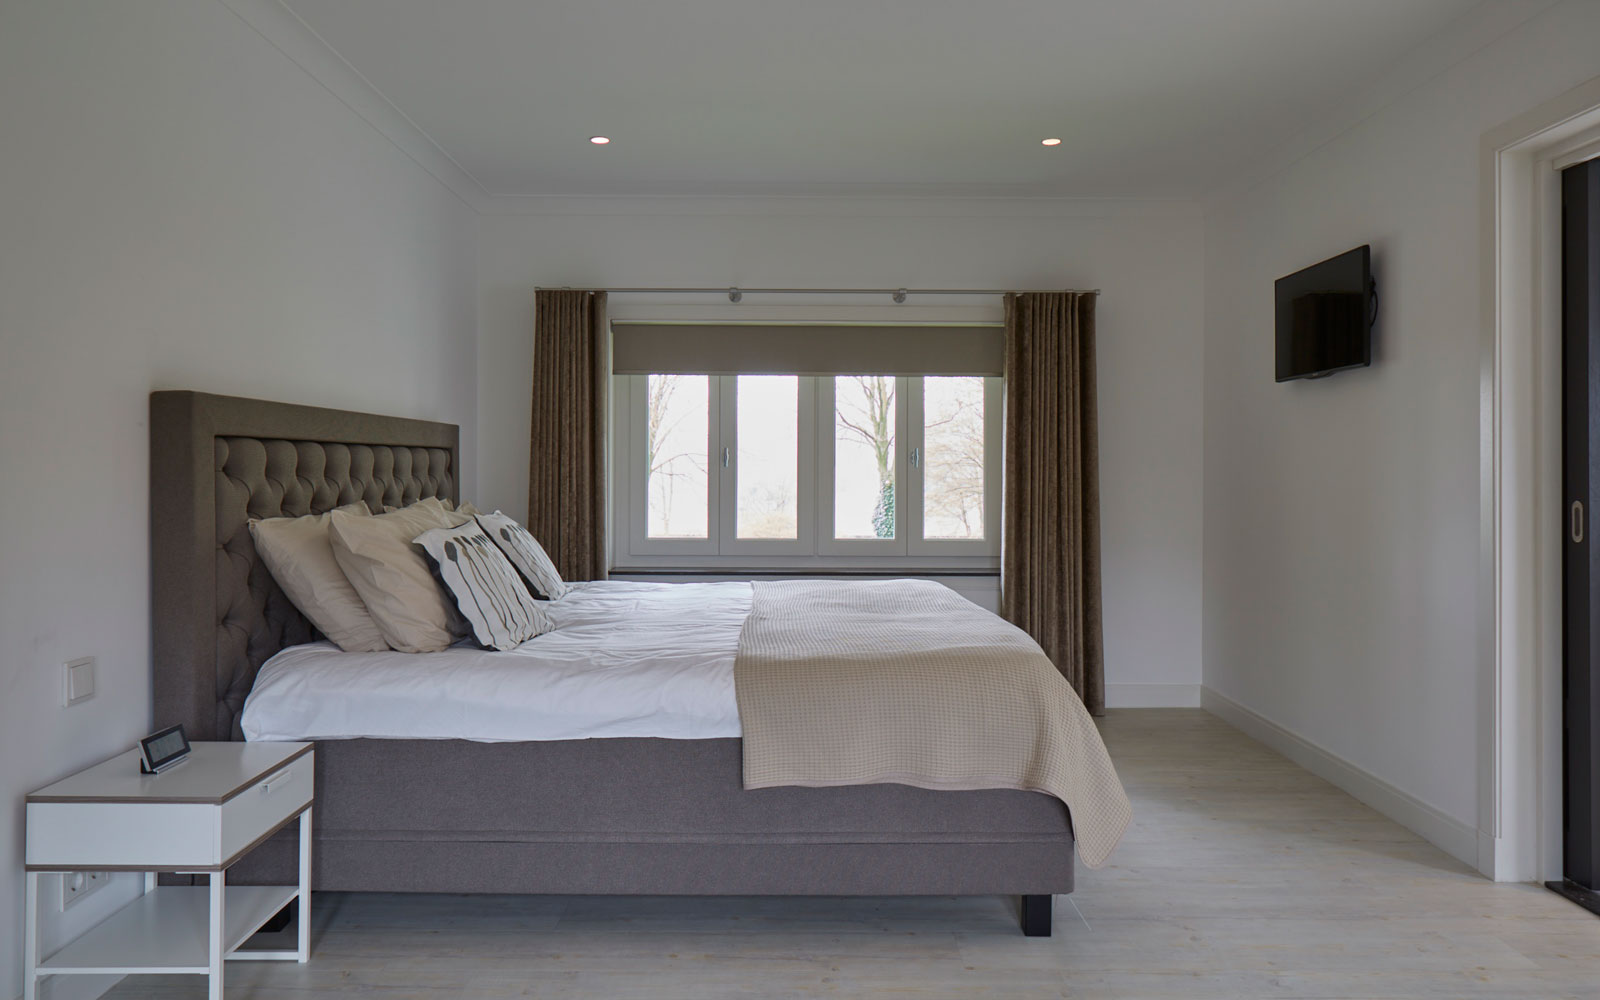 Slaapkamer, bed, boxspring, Swiss Sense, master bedroom, jaren 30 villa, Marco Daverveld